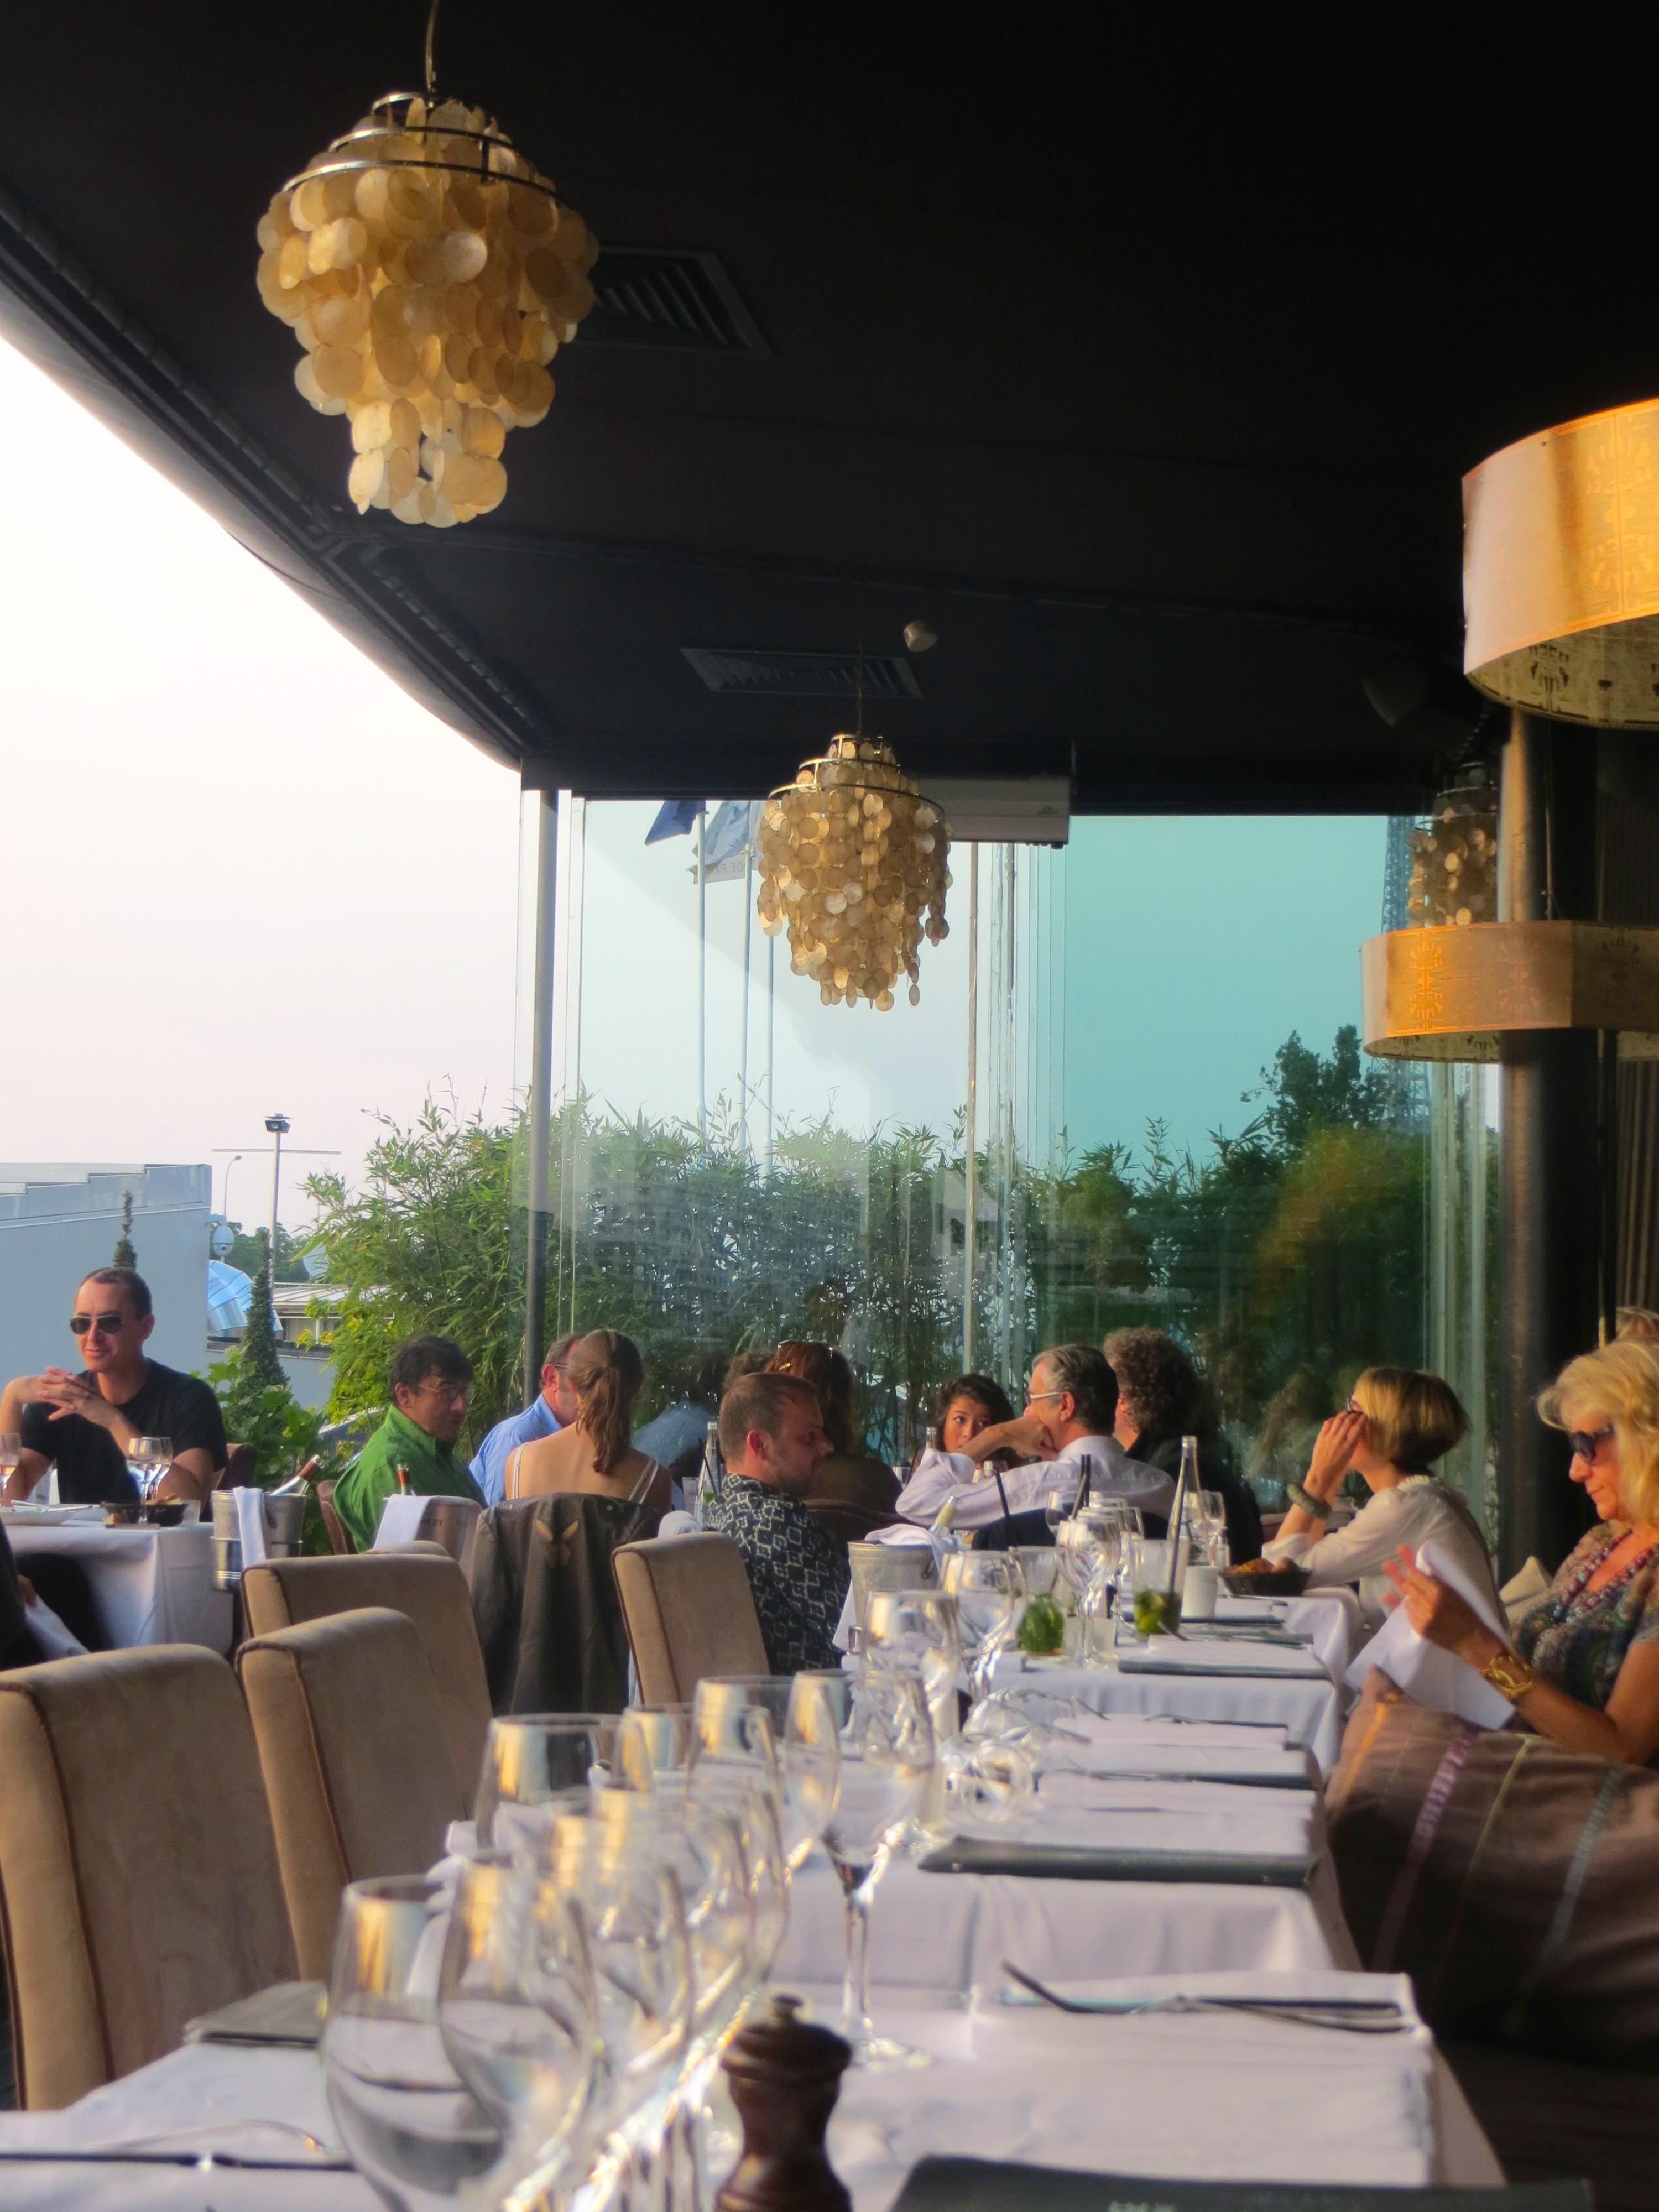 14 july 2013 in Paris at La Plage Restaurant